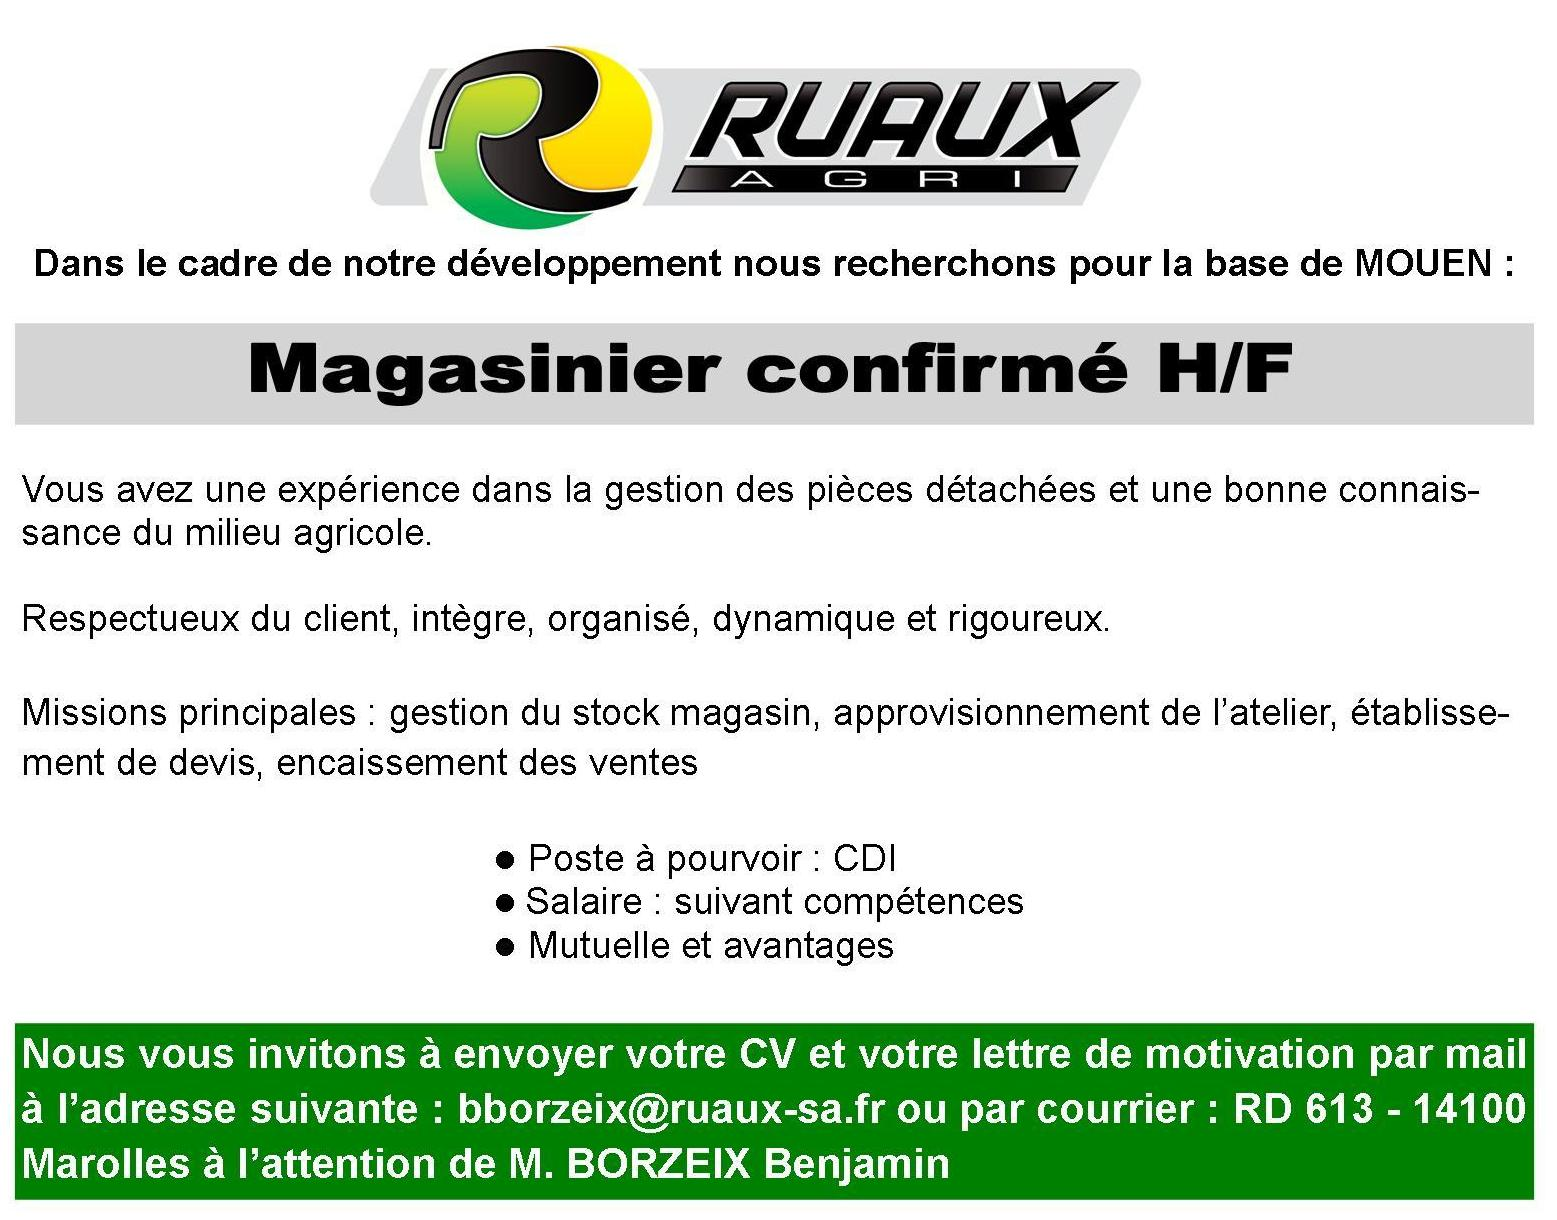 Ruaux